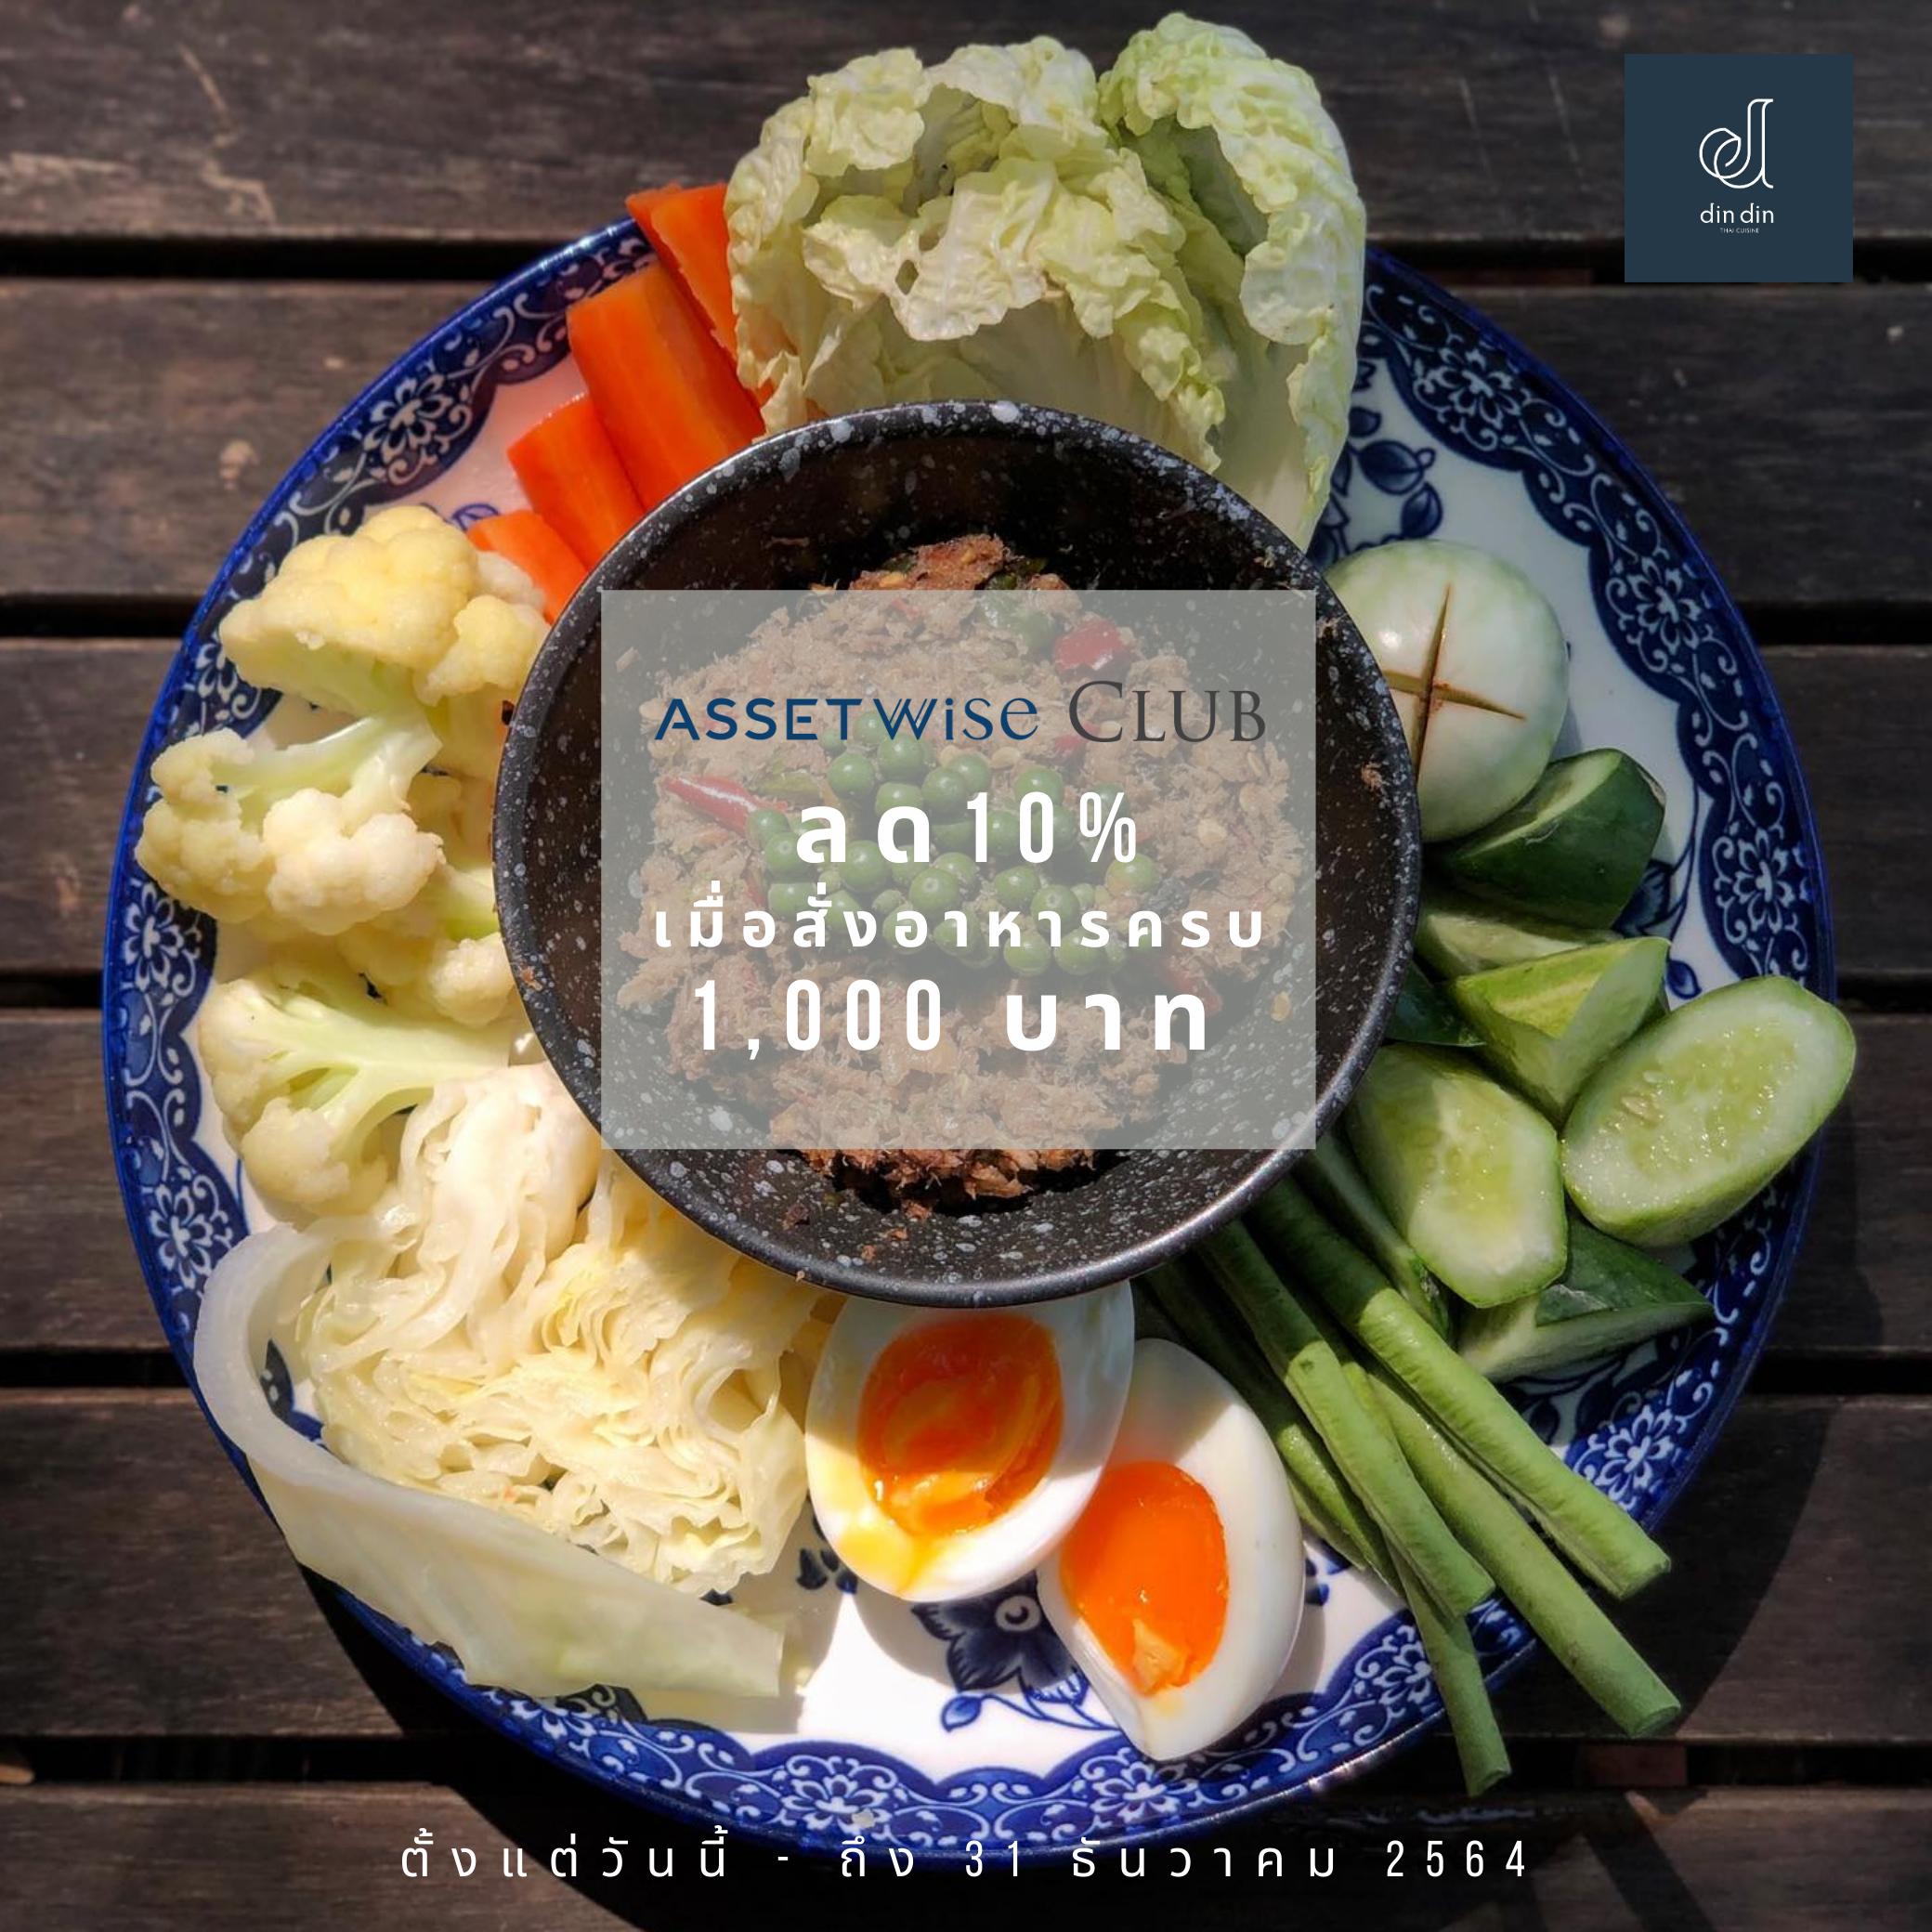 Din Din Thai Cuisine มอบส่วนลดพิเศษให้กับสมาชิก AssetWise Club